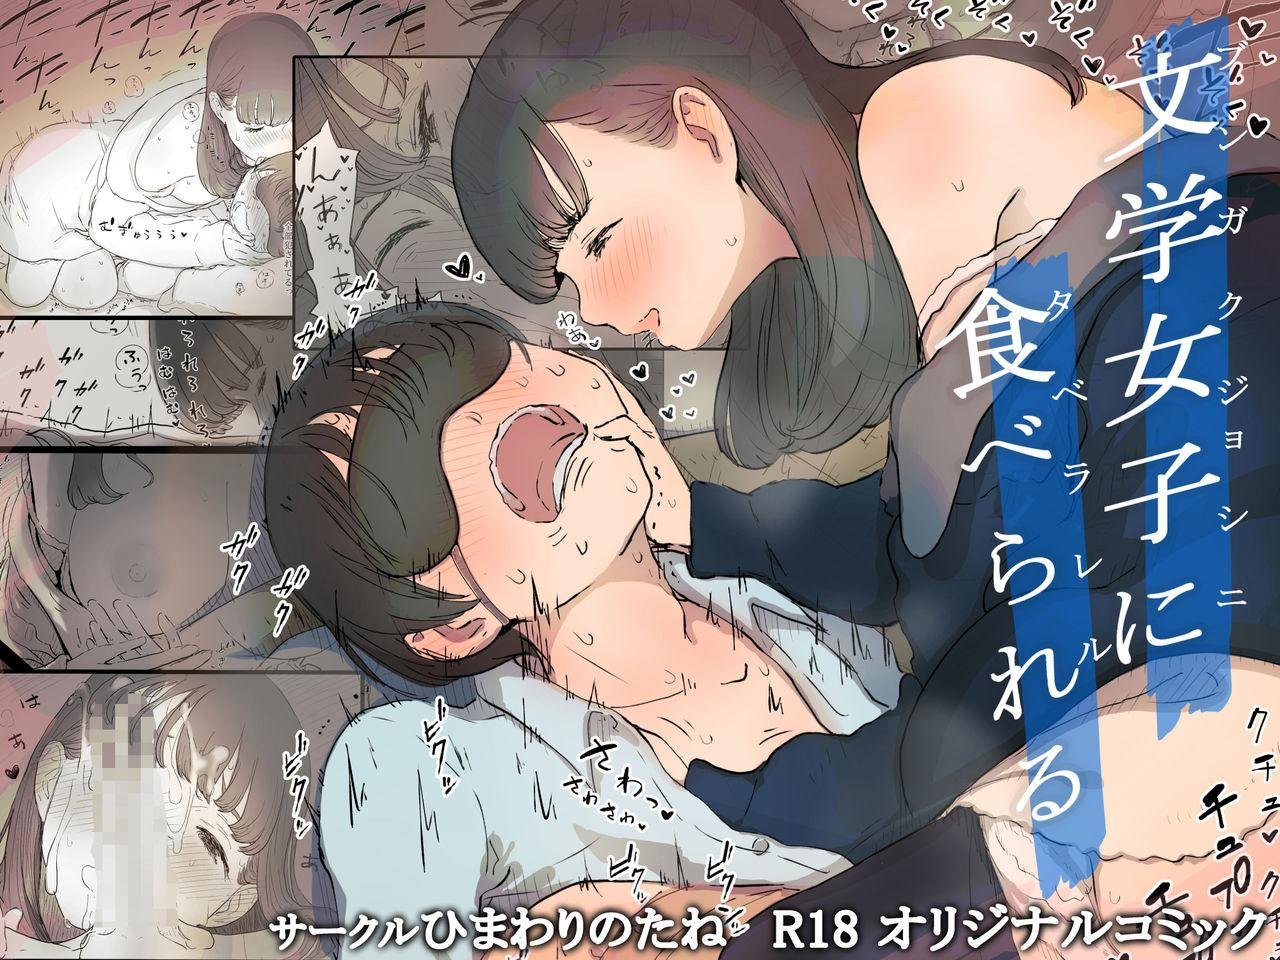 Bungaku Joshi ni Taberareru | Eaten Up by the Bookworm Girl 0